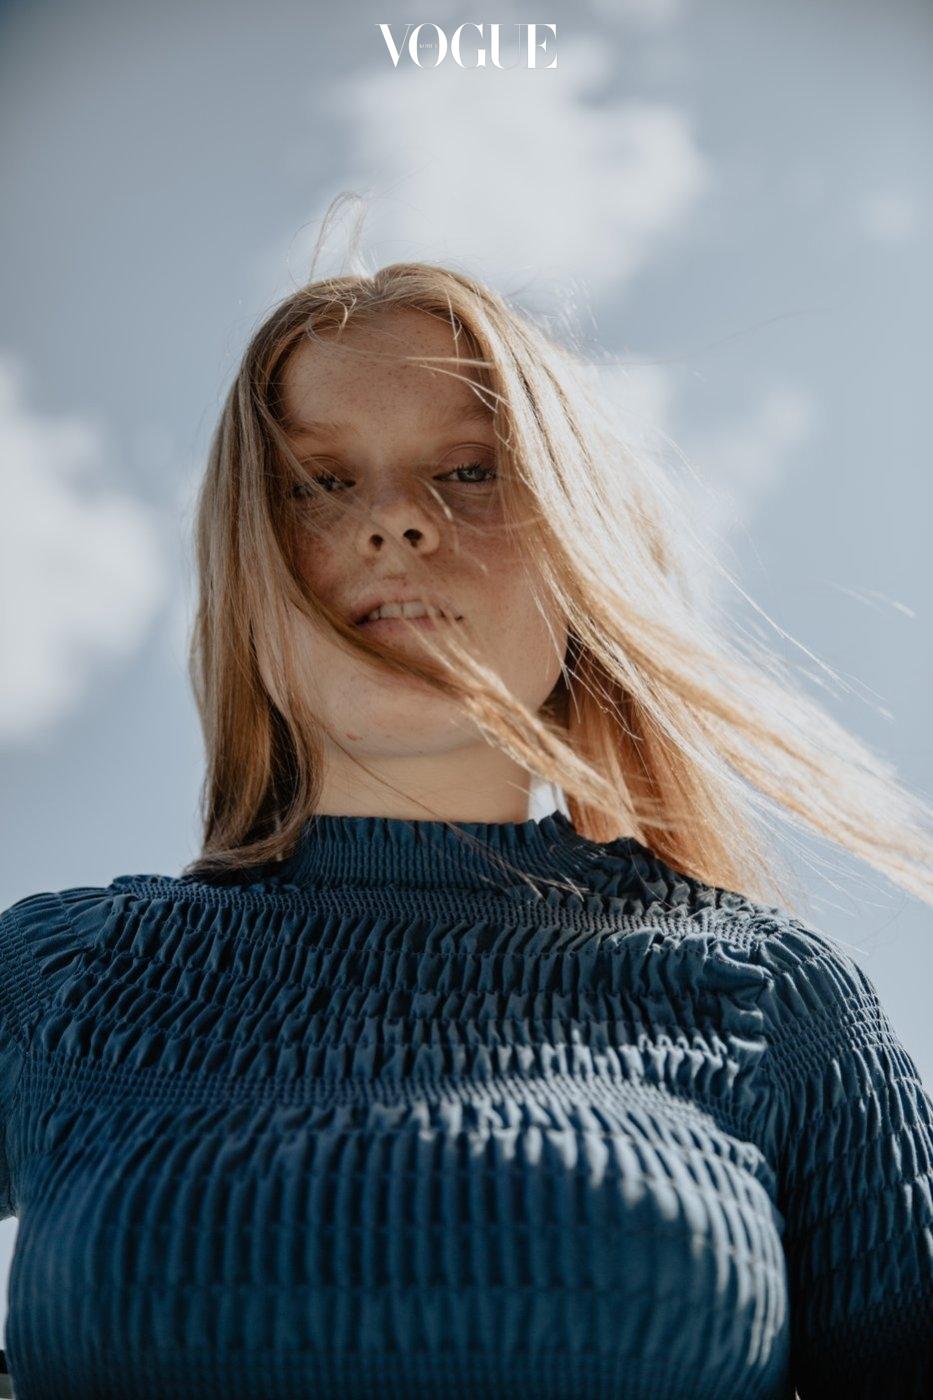 At Helsinki Fashion Week 2019